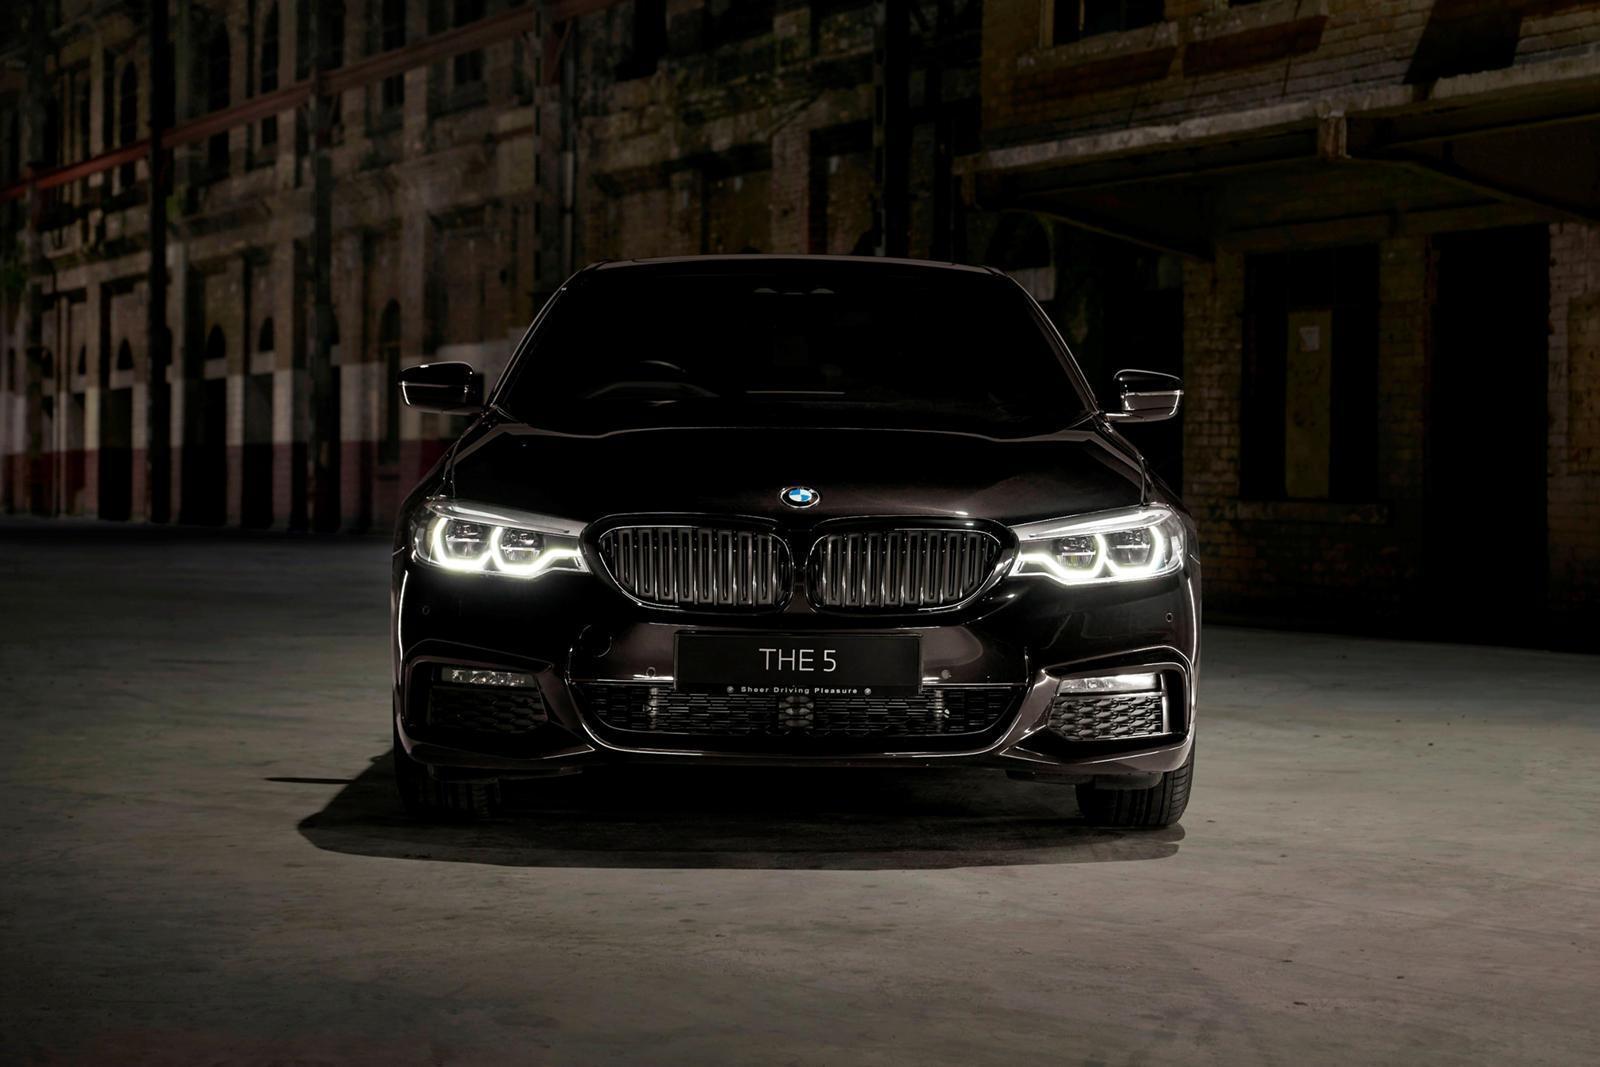 BMW 5 series phiên bản Dark Shadow Edition siêu 'ngầu'